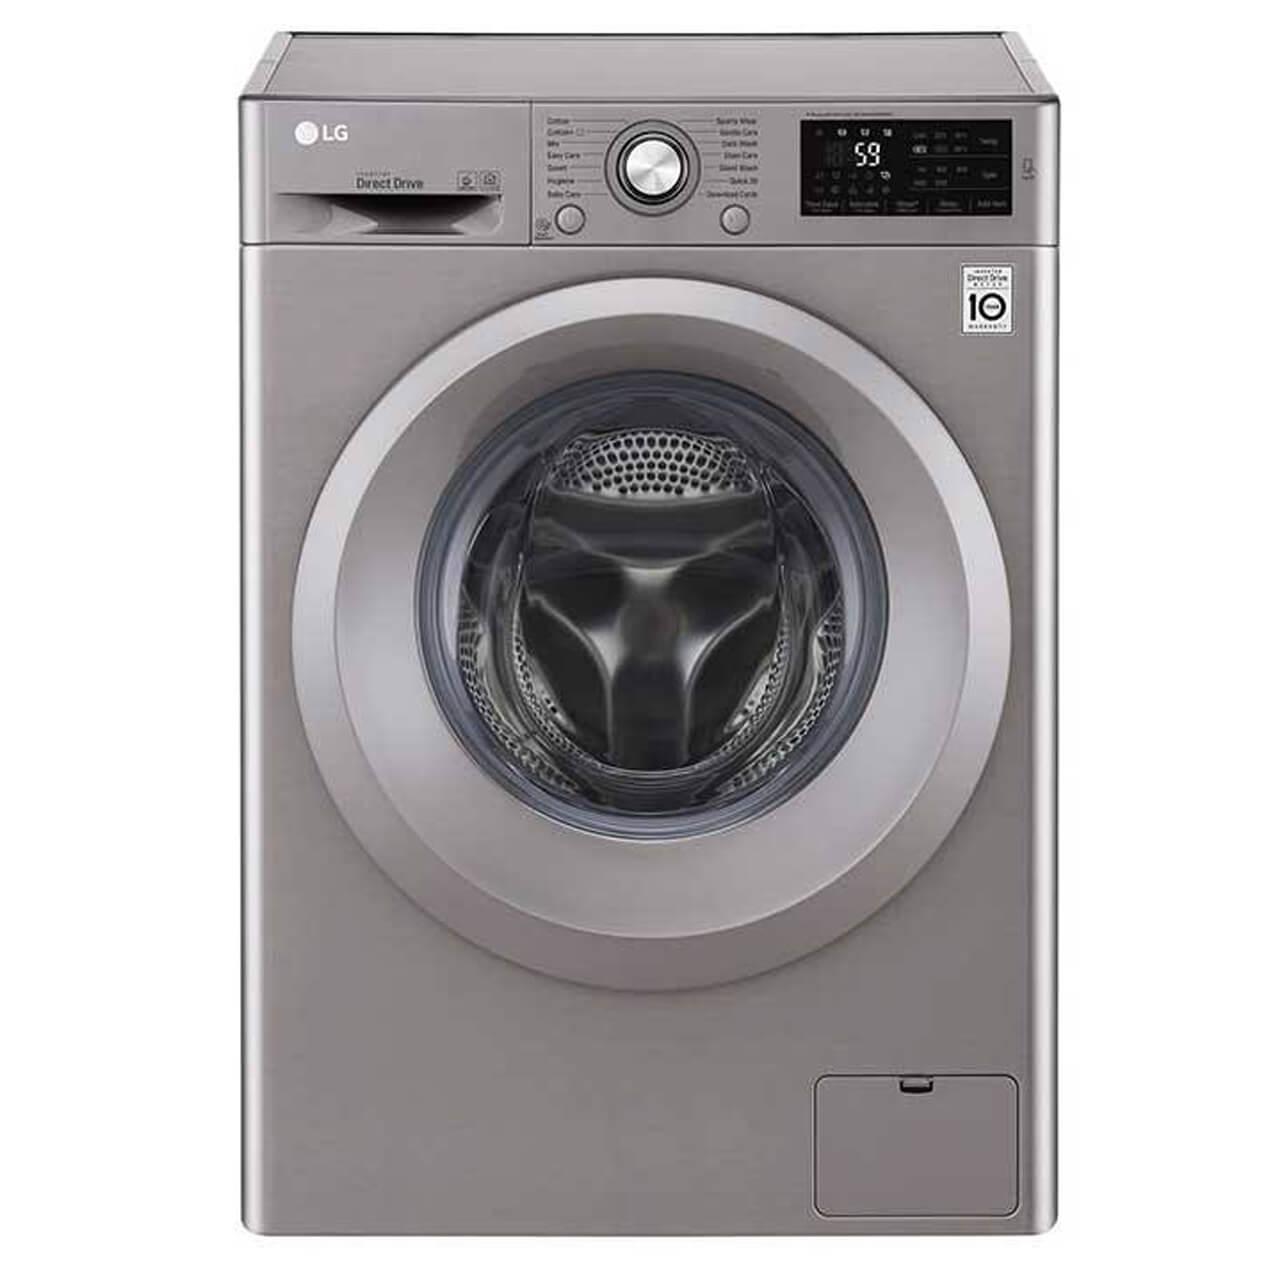 ال جی ماشين لباسشويي ال جي مدل WM-721N ظرفيت 7 کيلوگرم | LG WM-۷۲۱N Washing Machine - ۷ kg